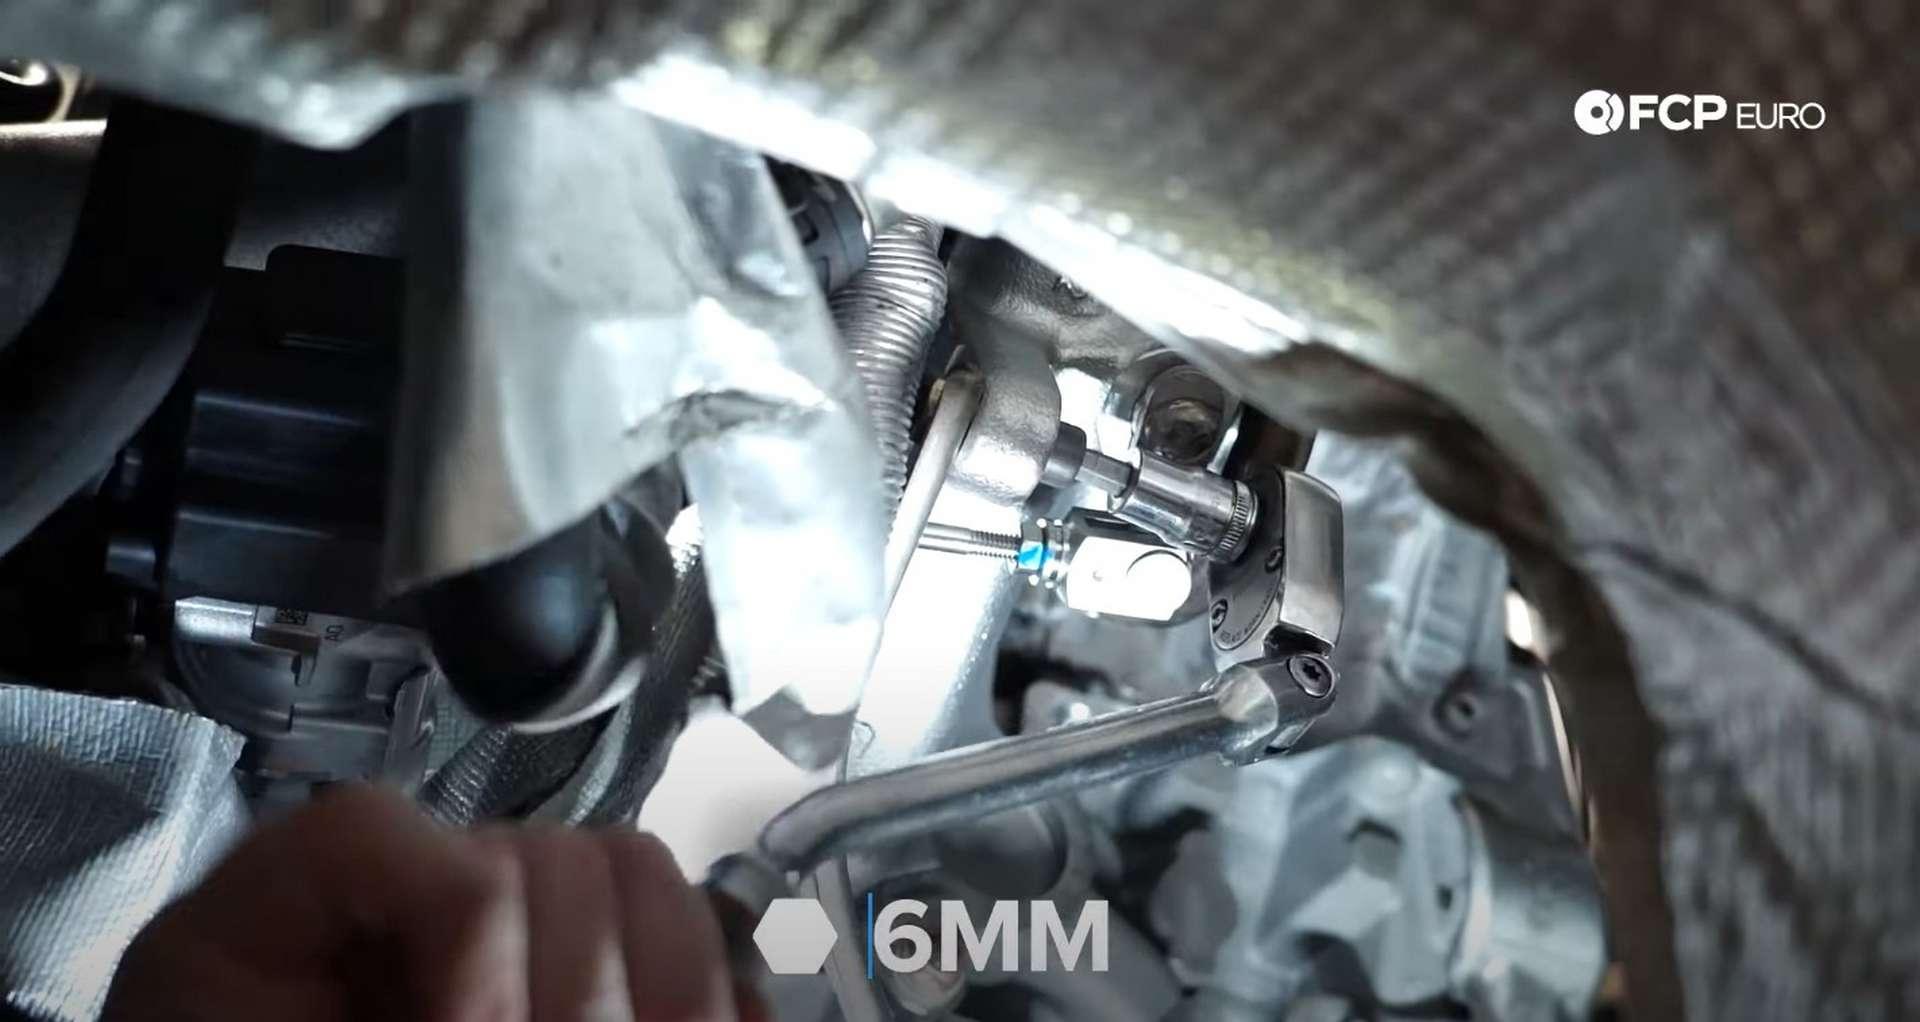 DIY MK7 VW GTI Turbocharger Upgrade installing the turbo support bracket